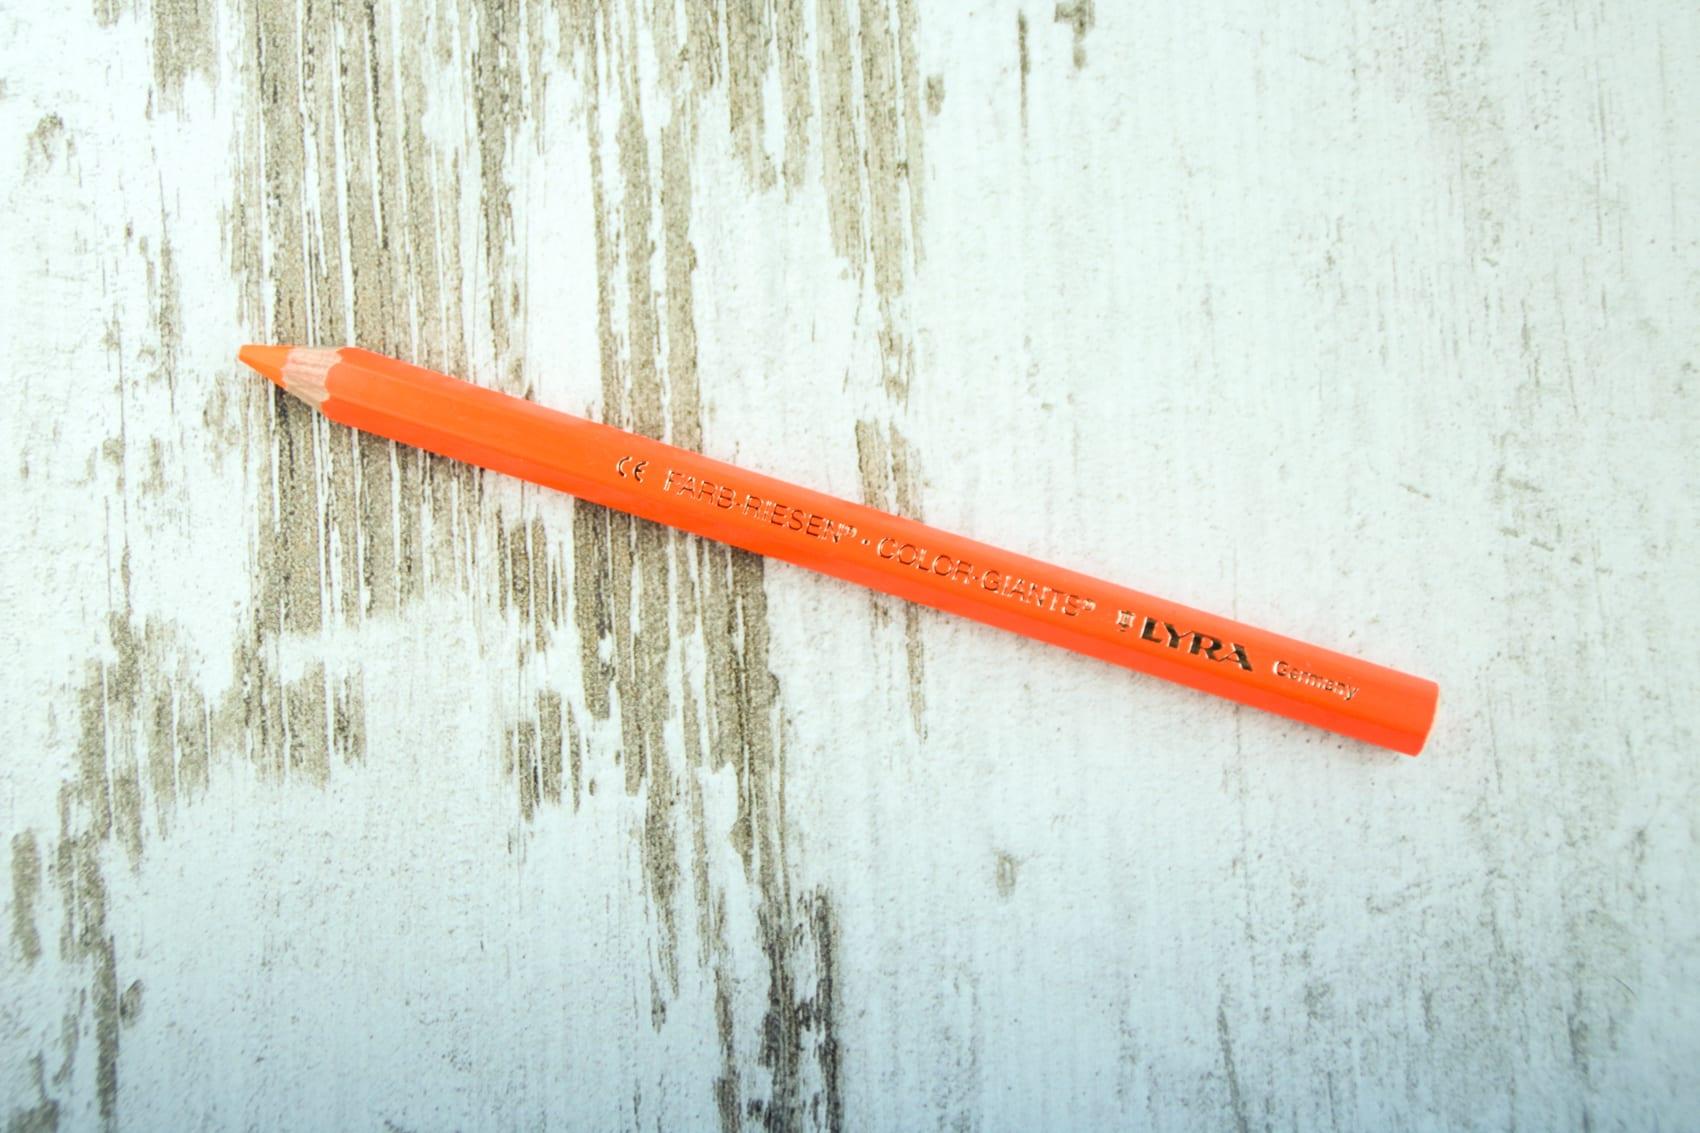 lyra oranje- bag-again, zero waste, houten highlighter potlood